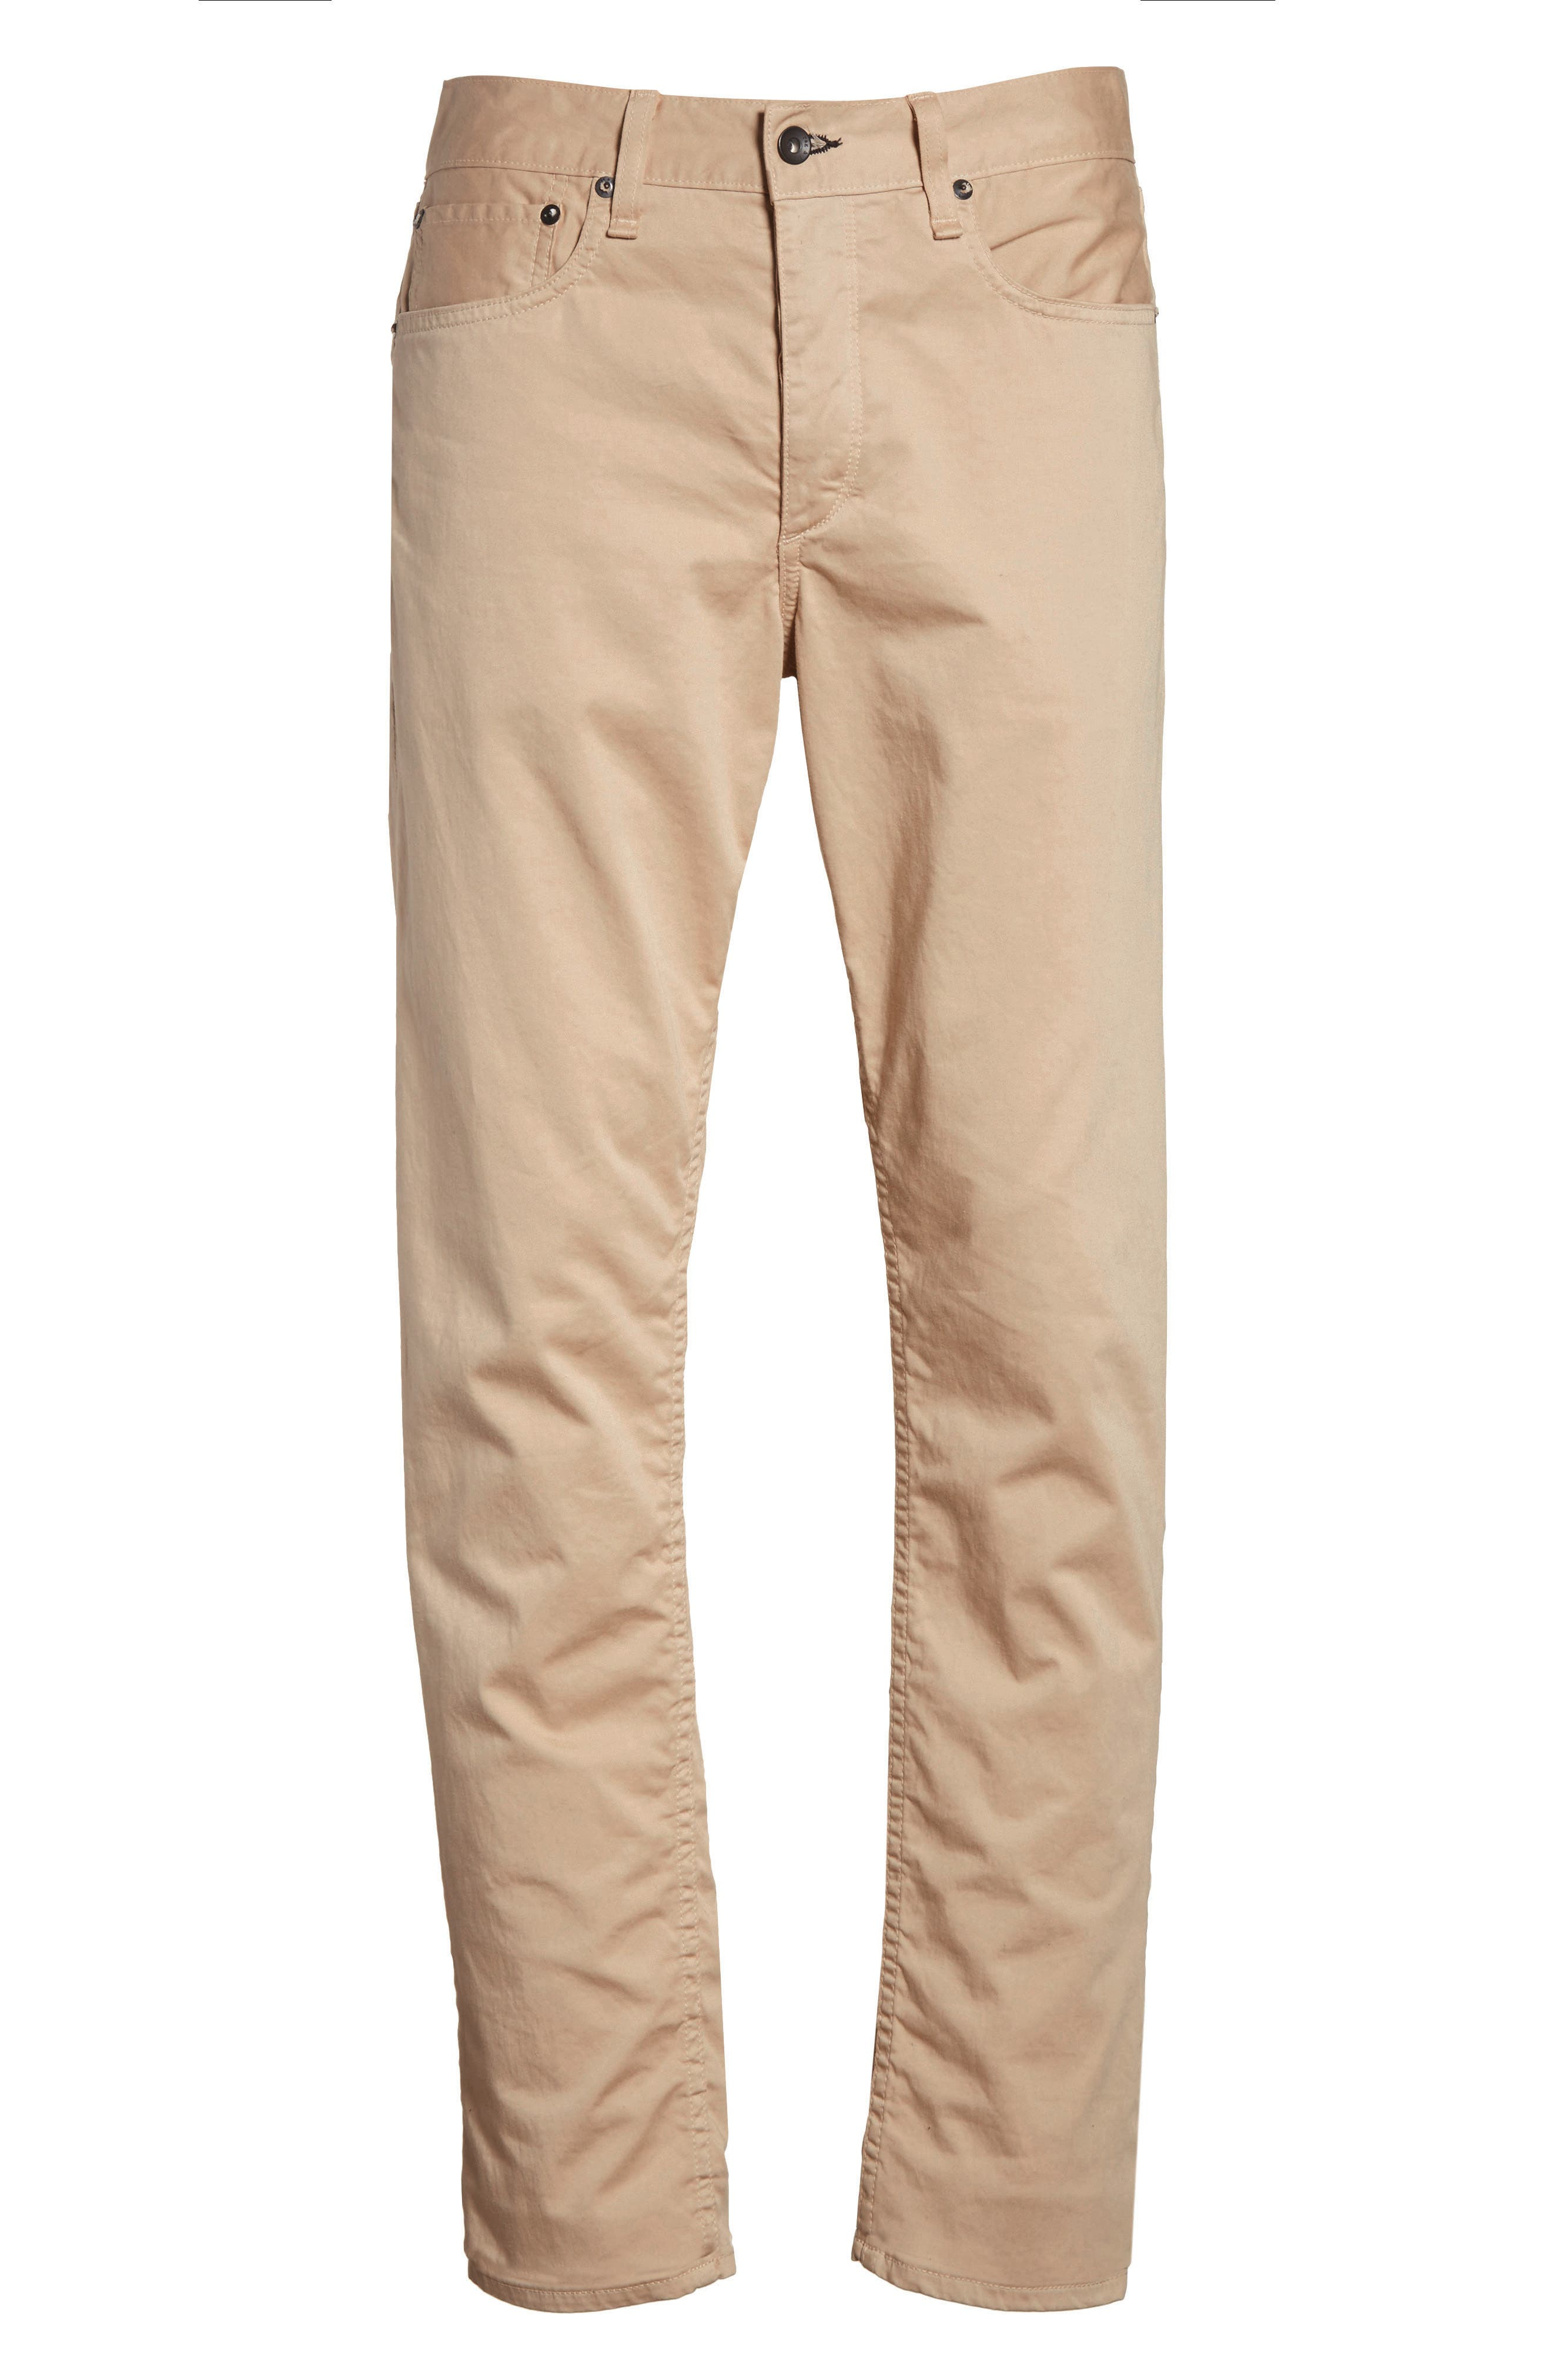 Fit 2 Five-Pocket Twill Pants,                             Alternate thumbnail 6, color,                             BEIGE